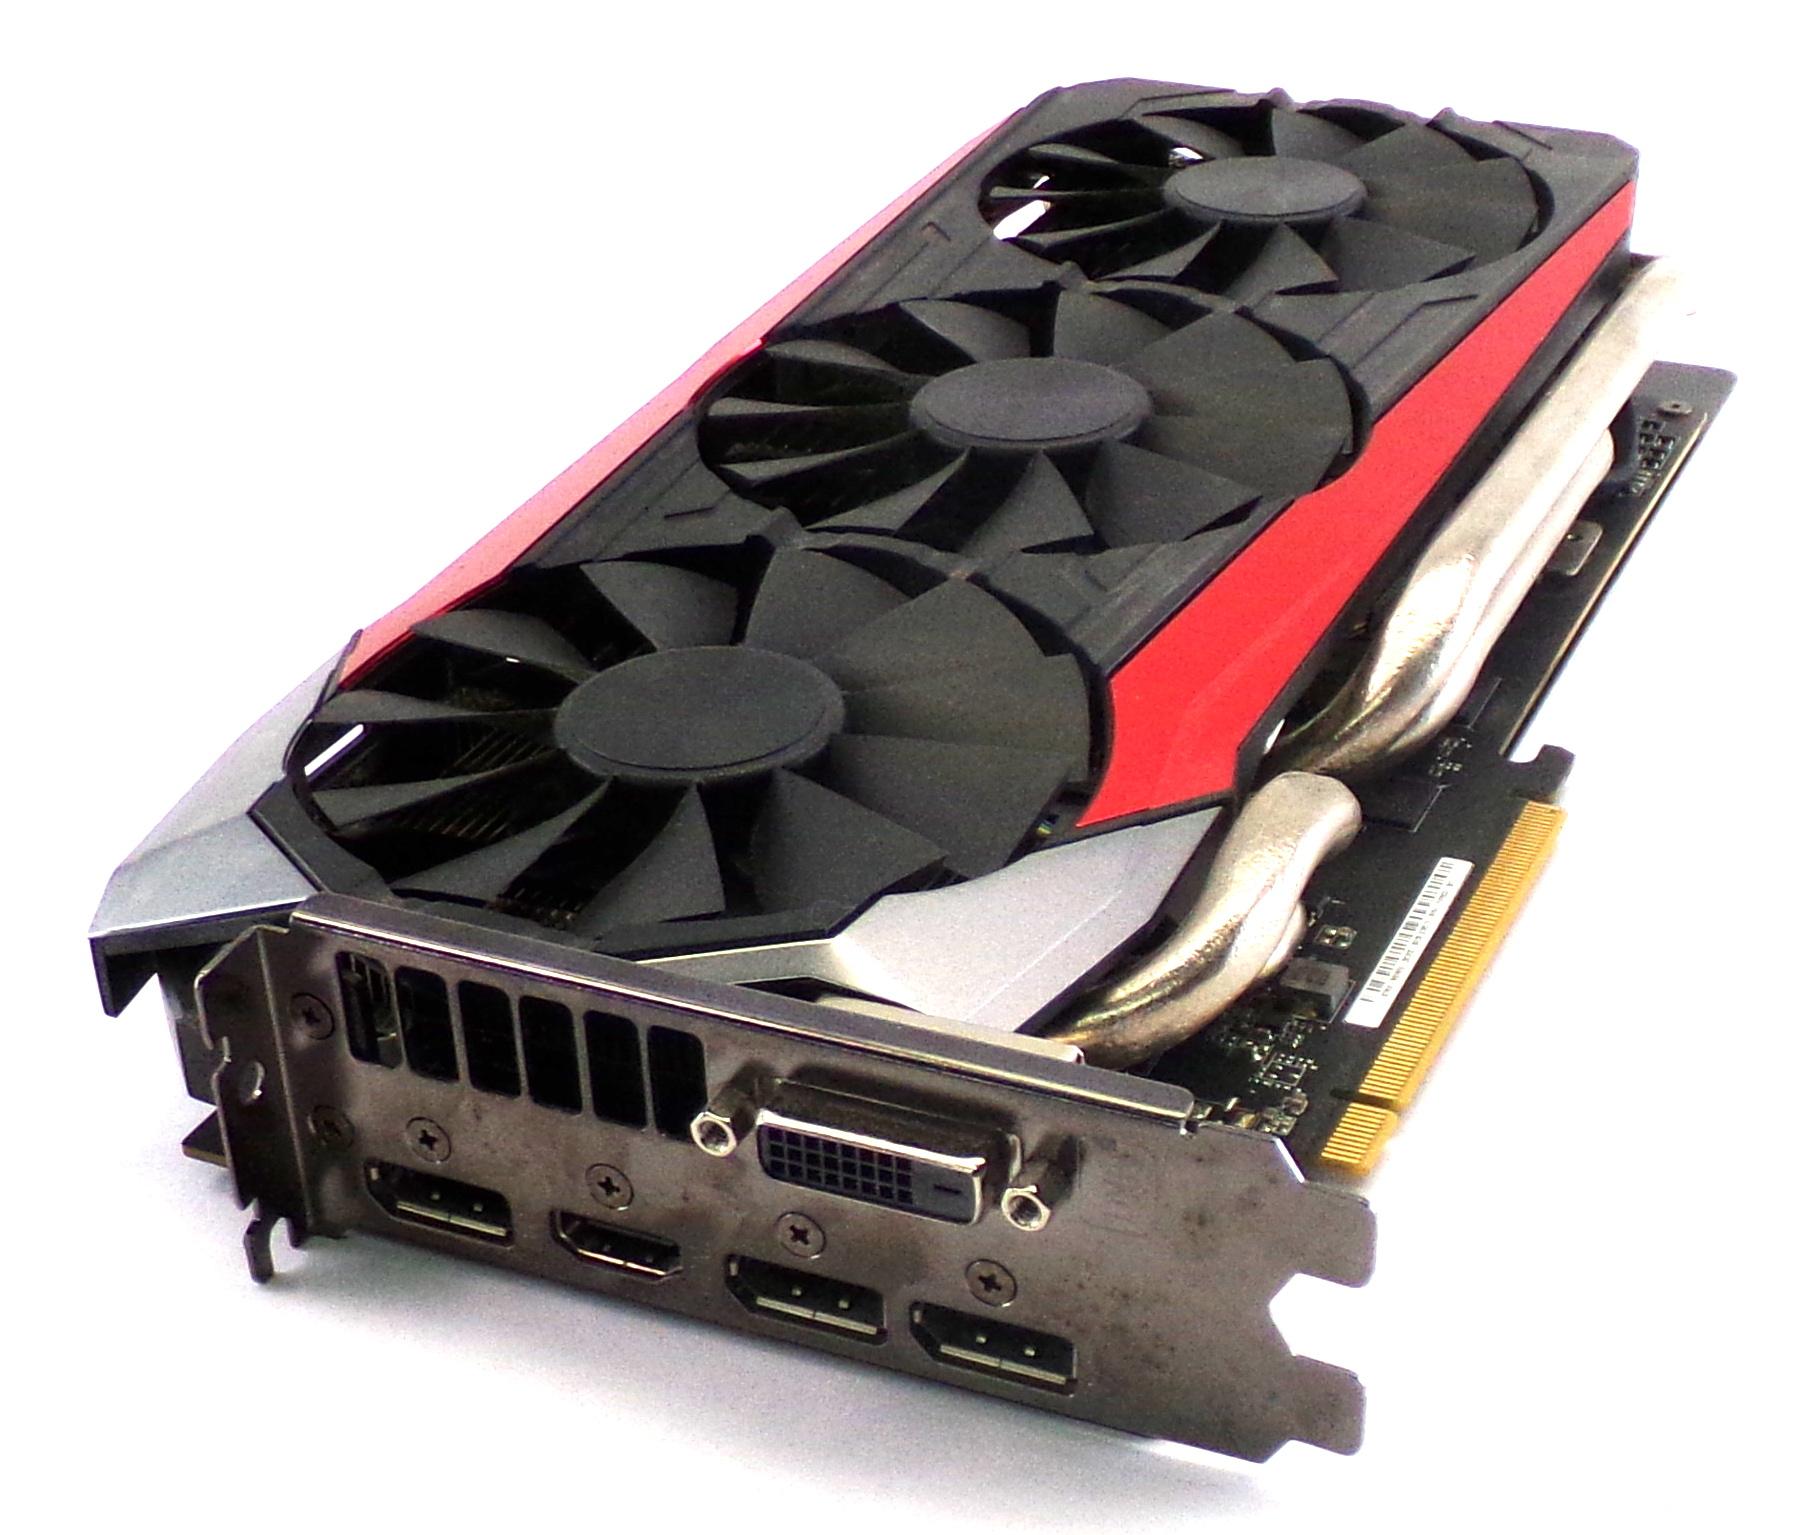 Asus STRIX-R9390X-DC3OC-8GD5-GAMING AMD Radeon R9 390X Strix Graphics Card